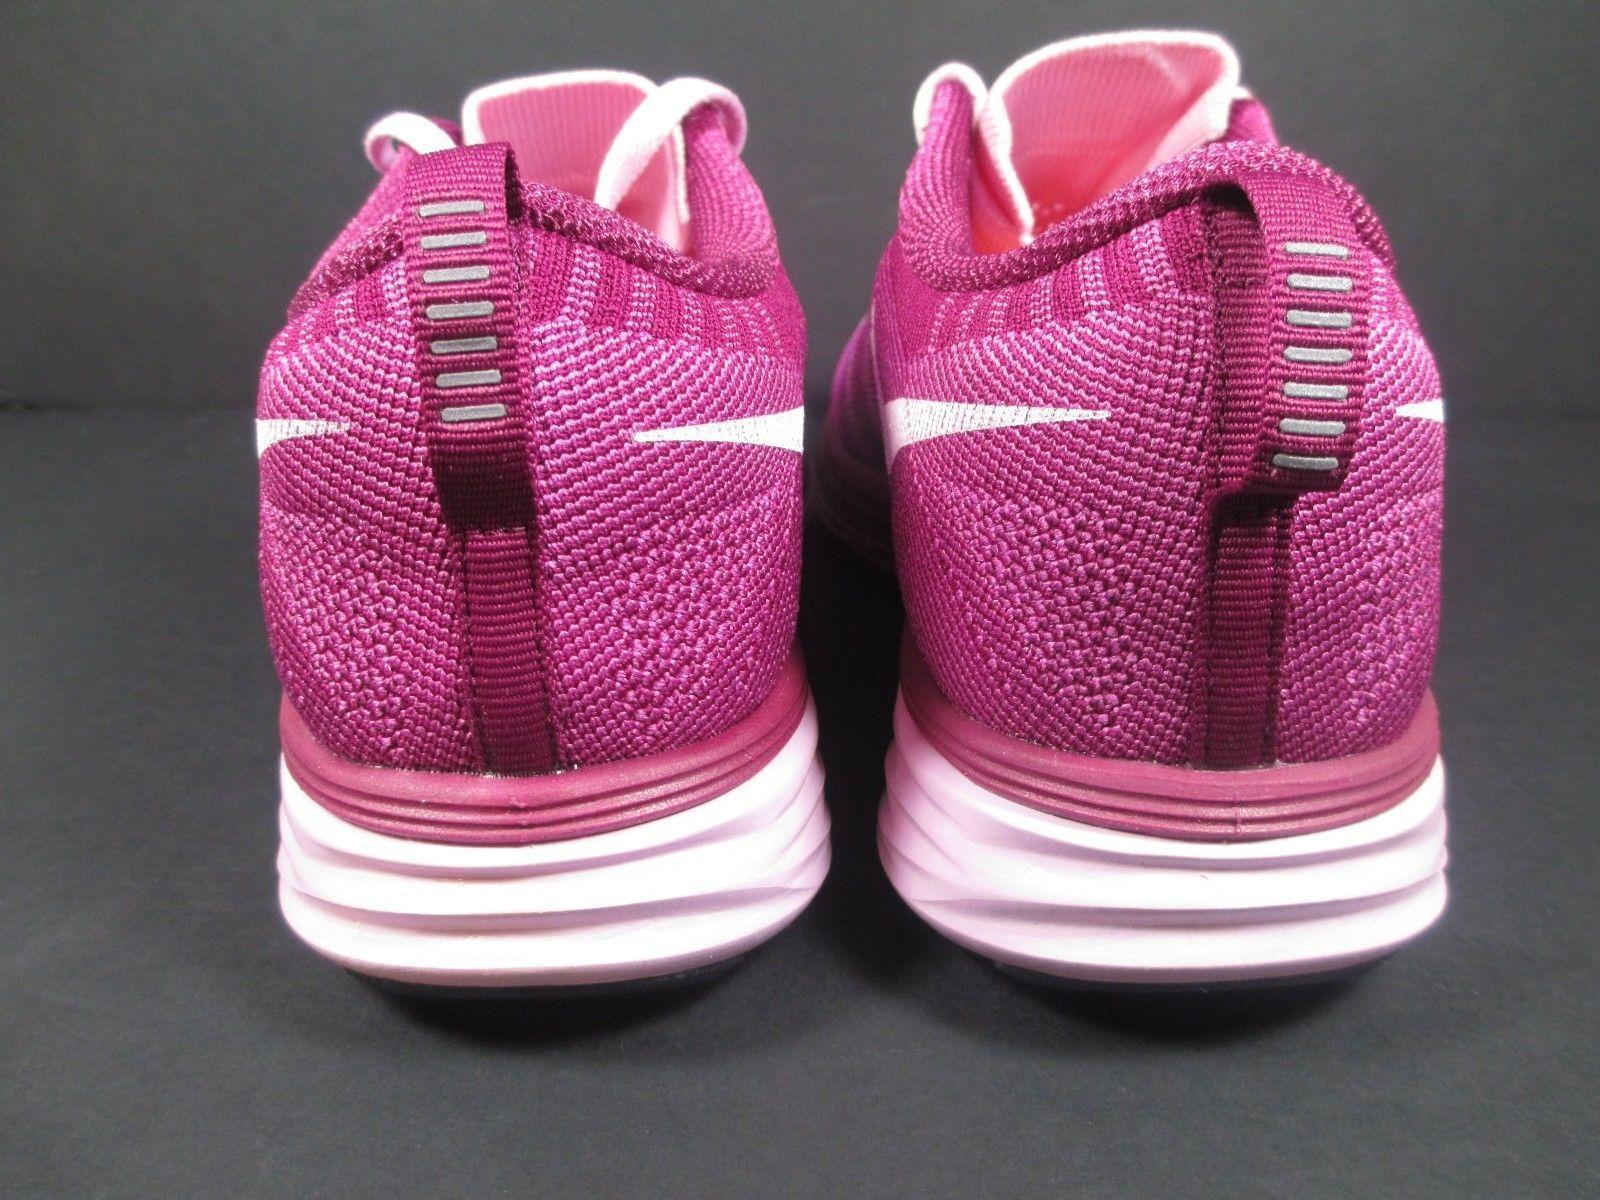 100% authentic 7e259 a8914 ... NIB Nike Flyknit Lunar Running Shoe 620658-615 Artic Pink Wht-Rspb  WOMENS Sz ...